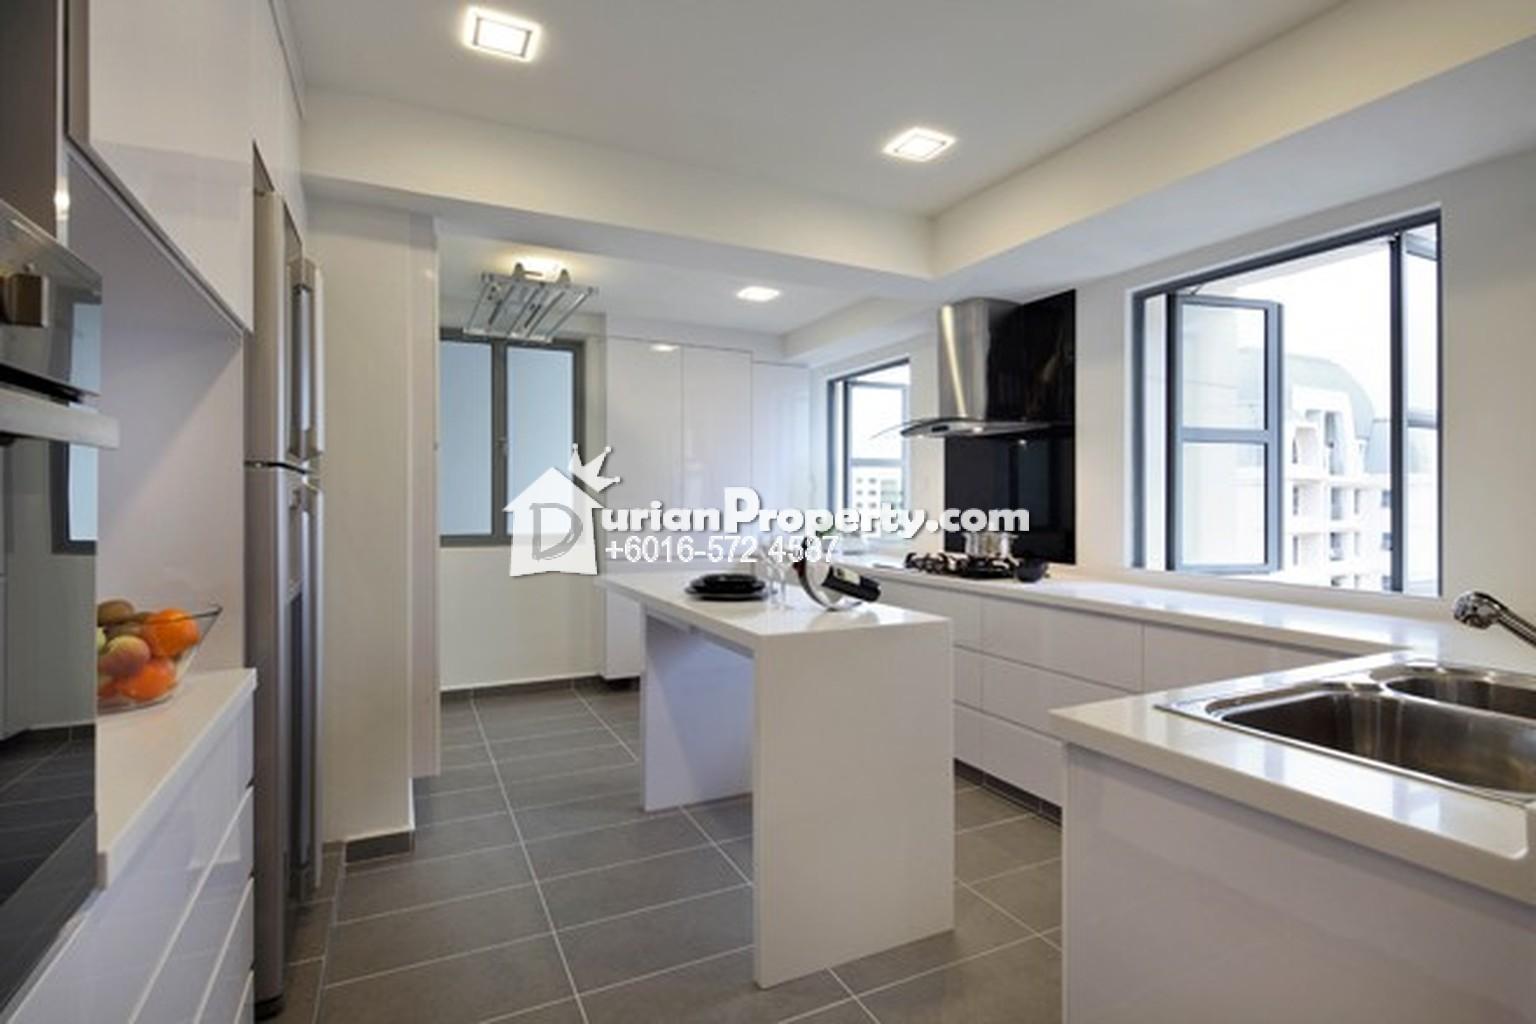 Condo for sale at taman desa saujana bangi for rm 345 000 for Singapore kitchen design ideas